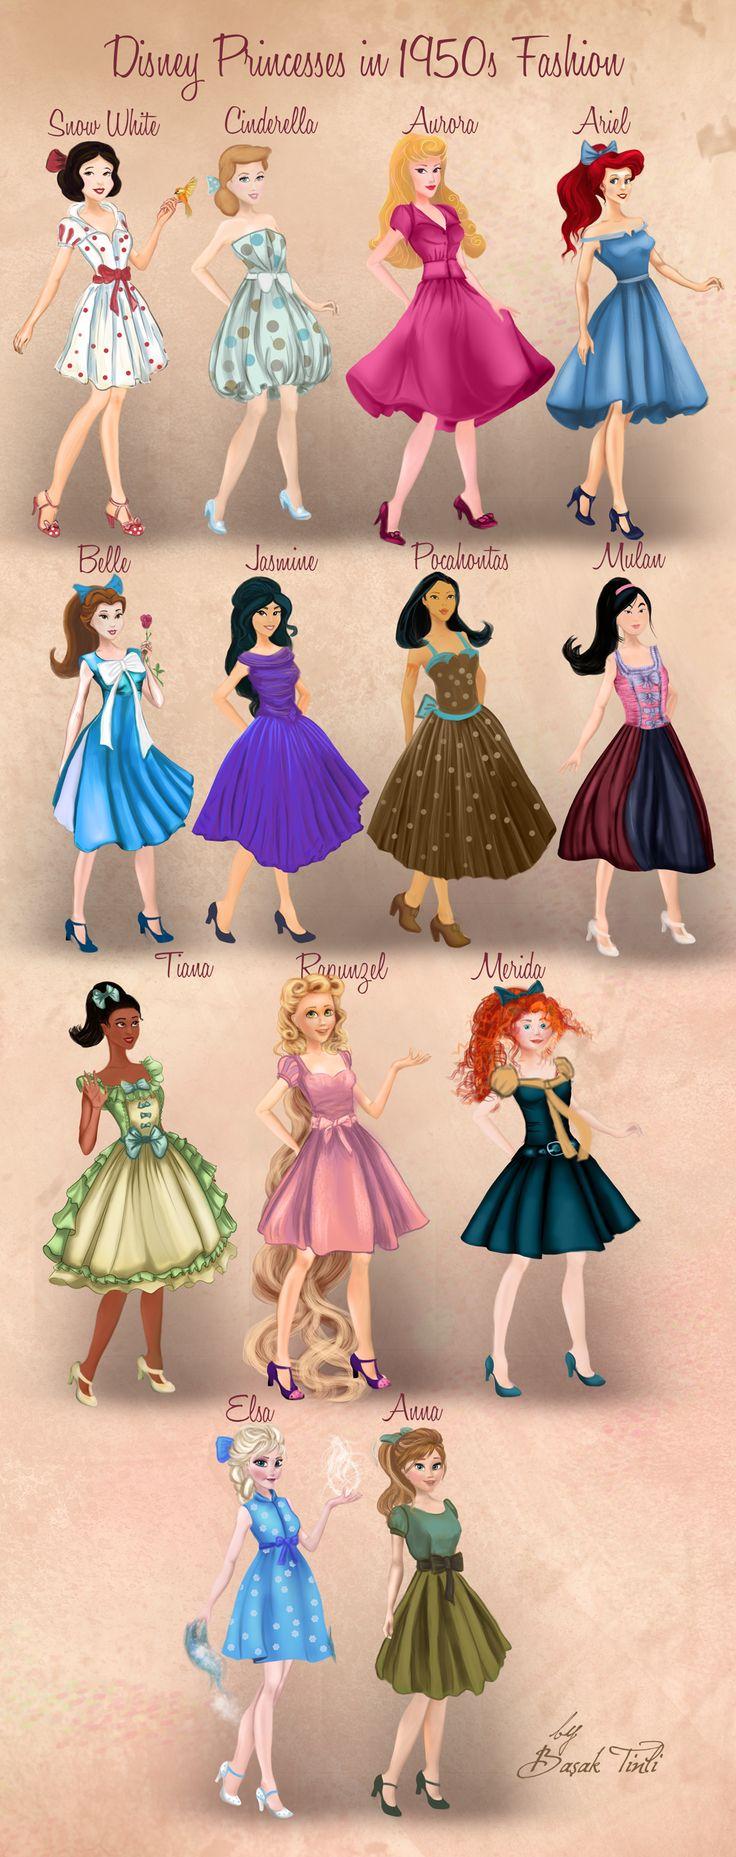 Disney Princesses in 1950s Fashion by Basak Tinli by BasakTinli.deviantart.com on @DeviantArt